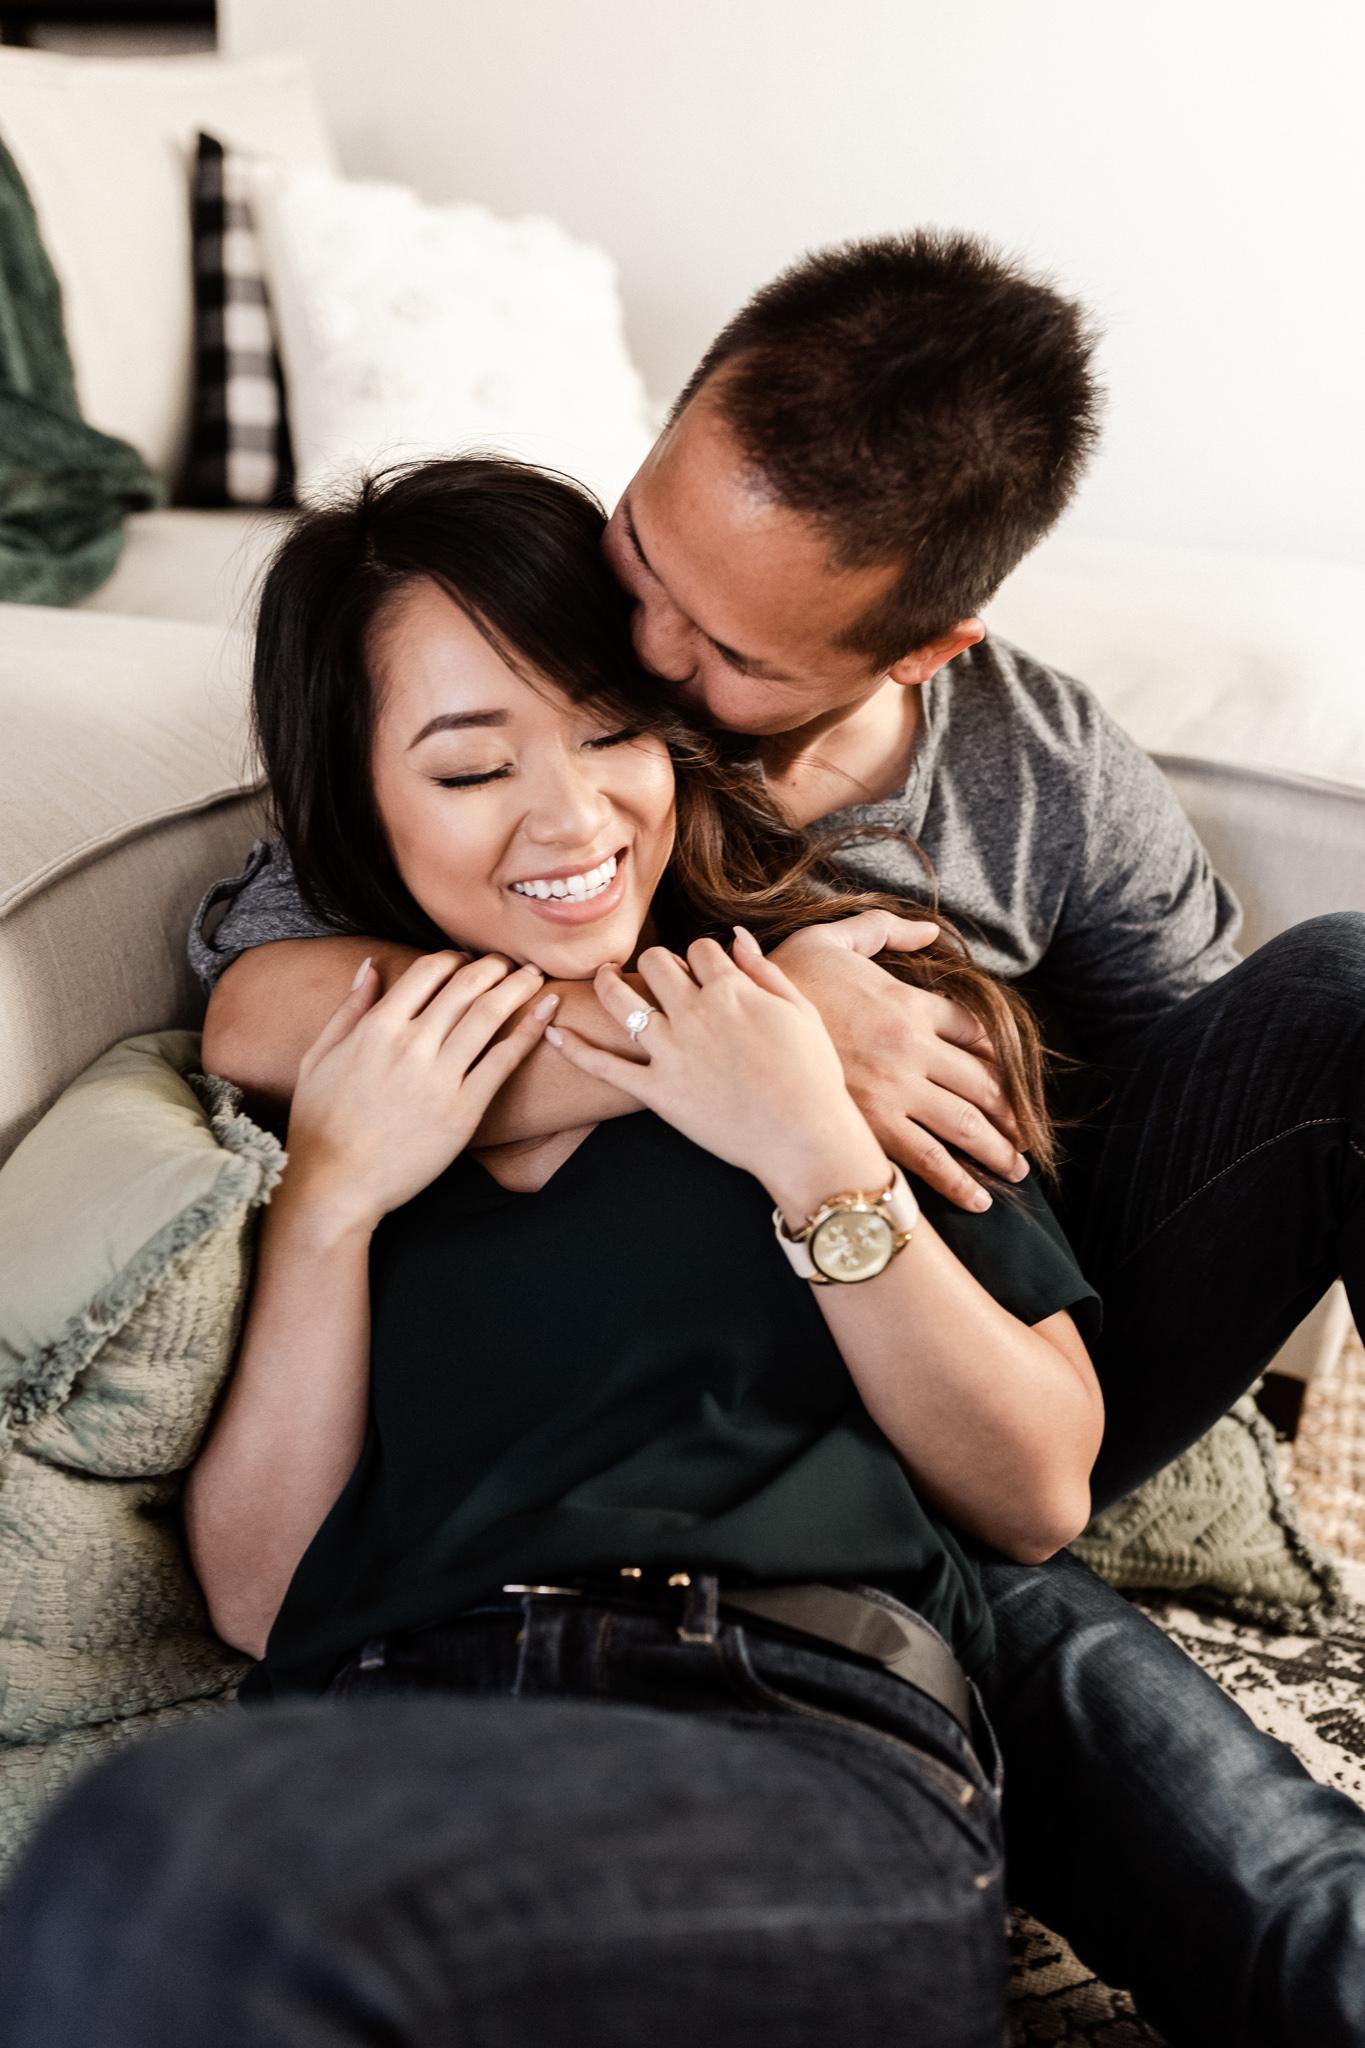 Hieu + Teresa | Colorful Romantic Downtown Engagements | Oklahoma Wedding Photographer-6.jpg